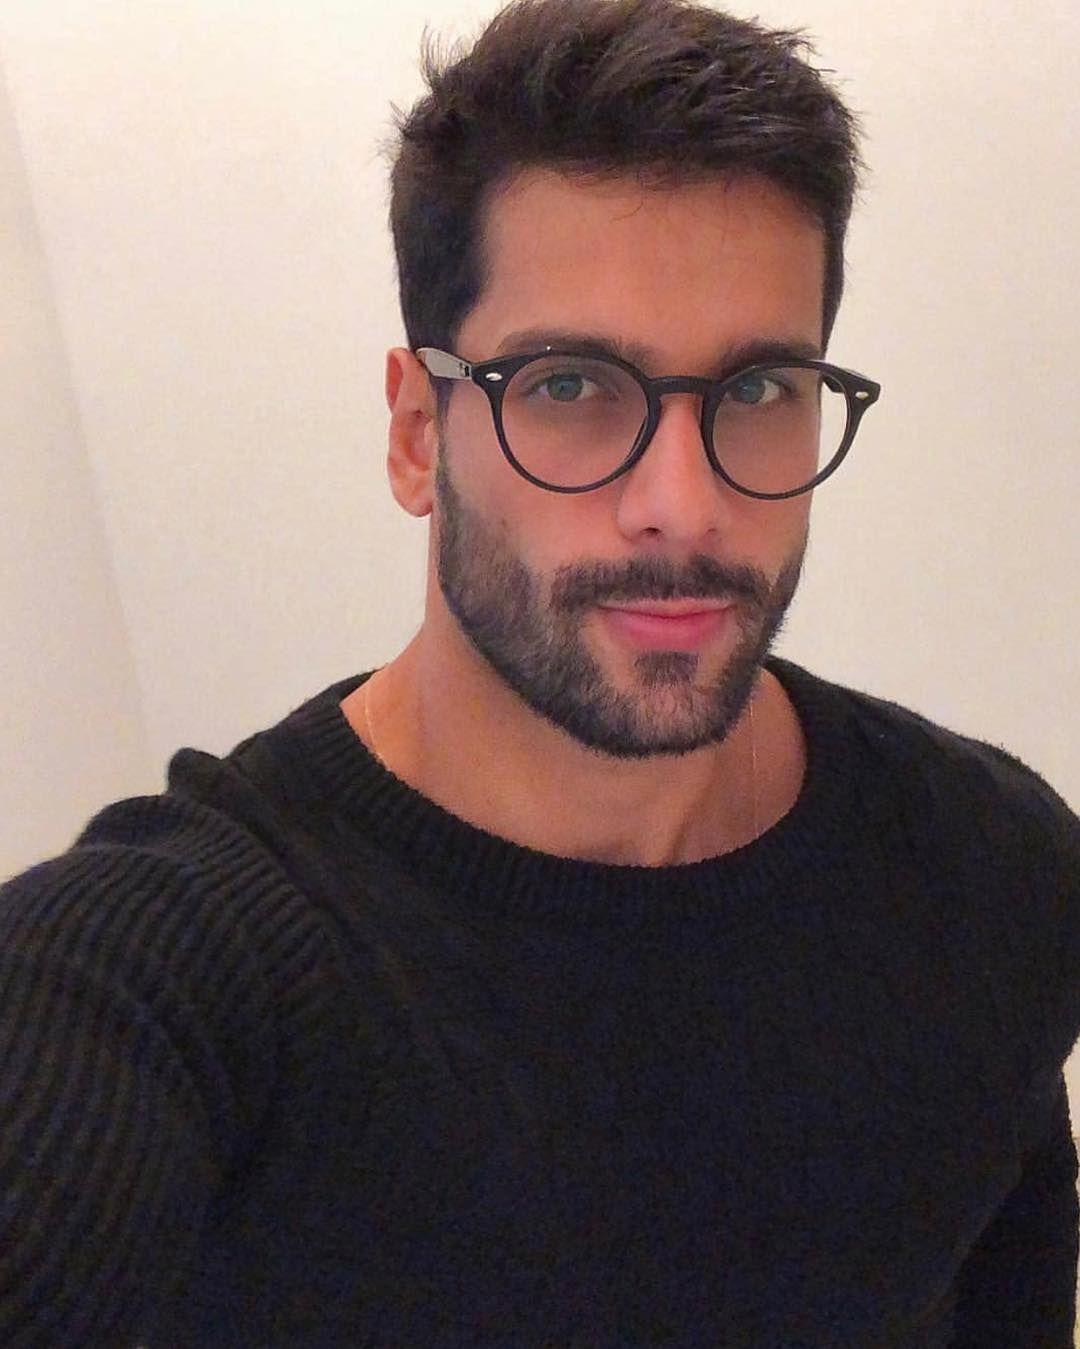 "9652c8c88 Moda Masculina Top Ⓜ on Instagram: ""Óculos do dia 👓 👌🏽 ✨"""